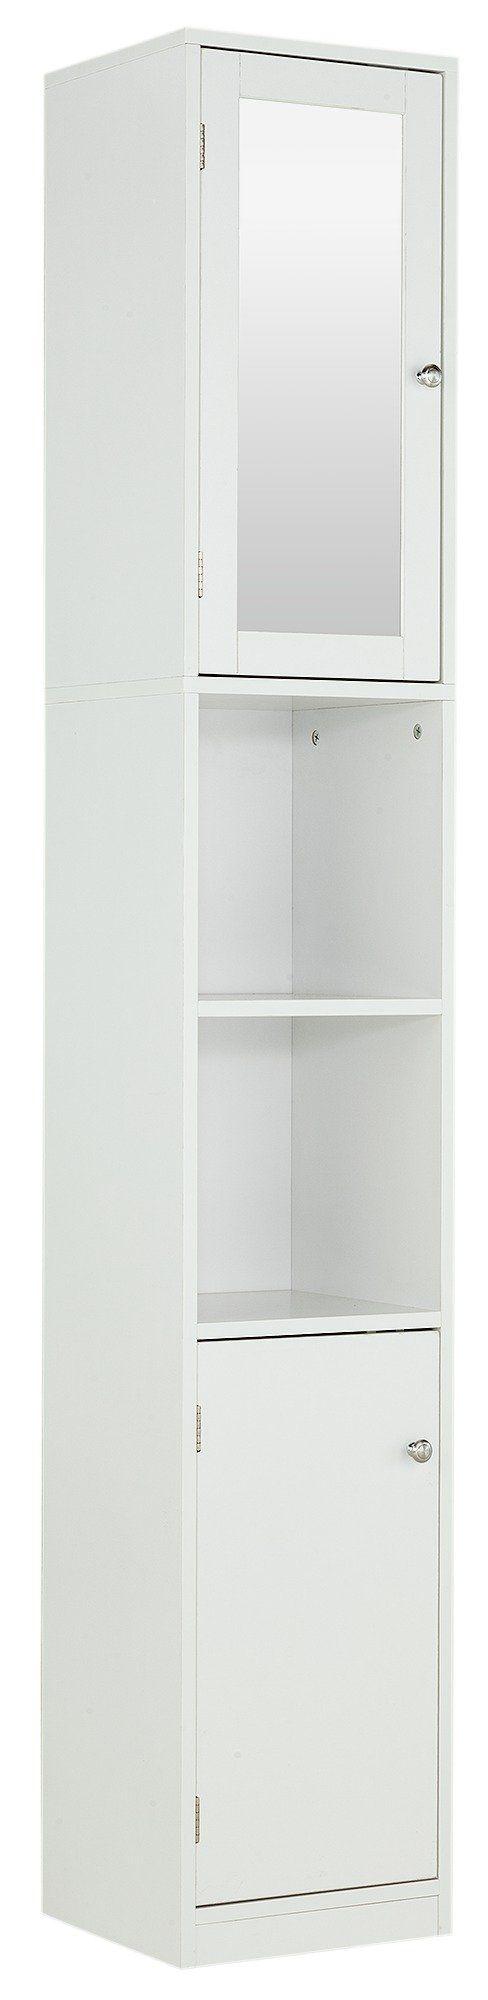 Bathroom Cabinets Company Endearing Design Decoration